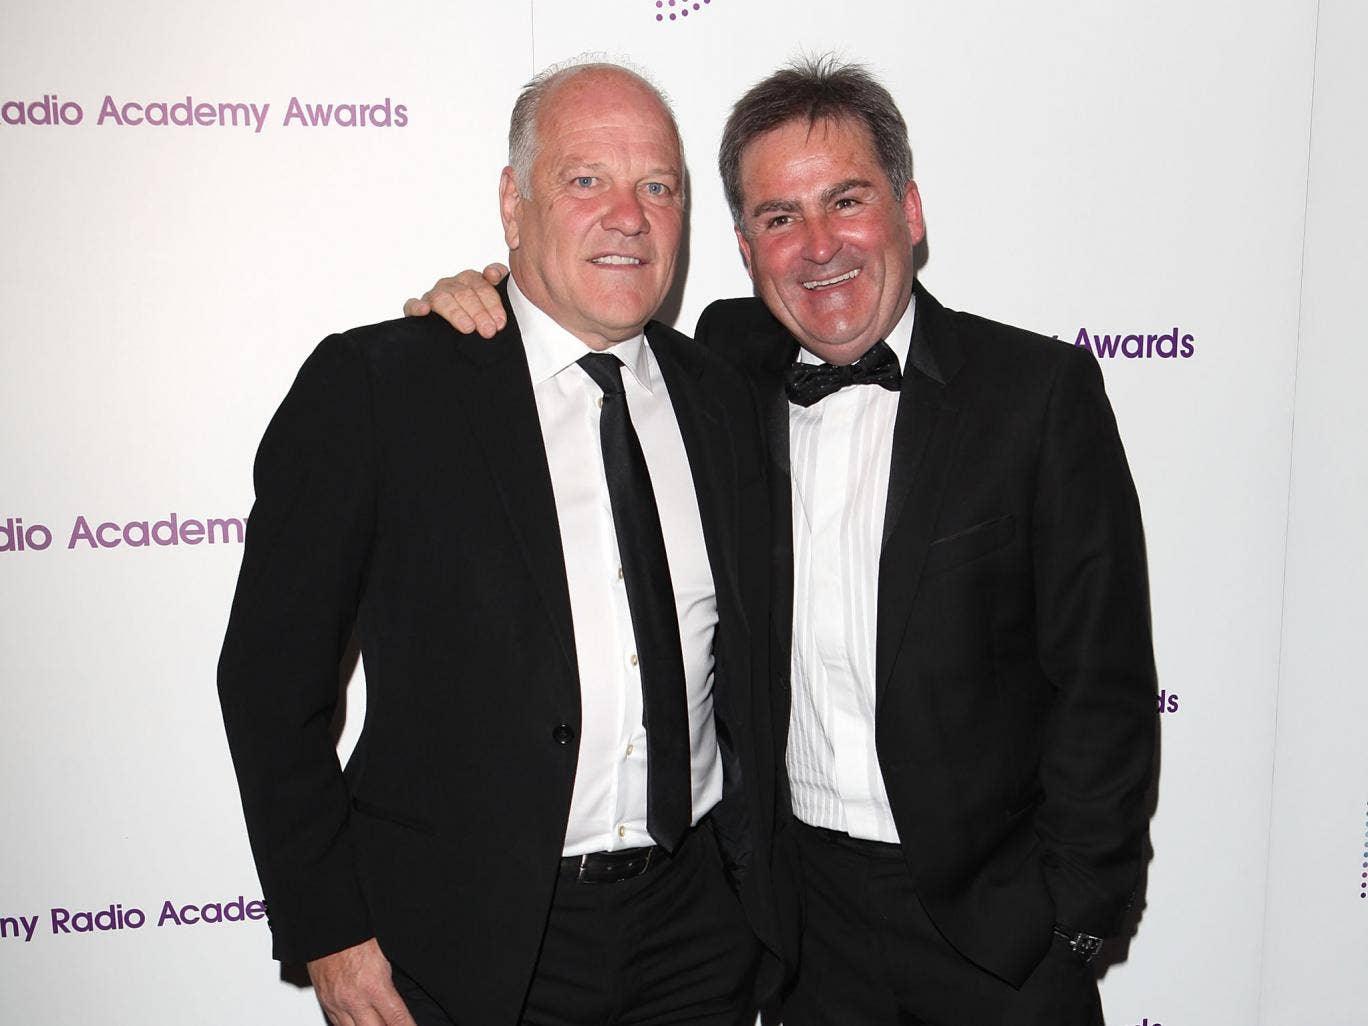 Andy Gray and Richard Keys at the Sony Radio Academy Awards in 2012